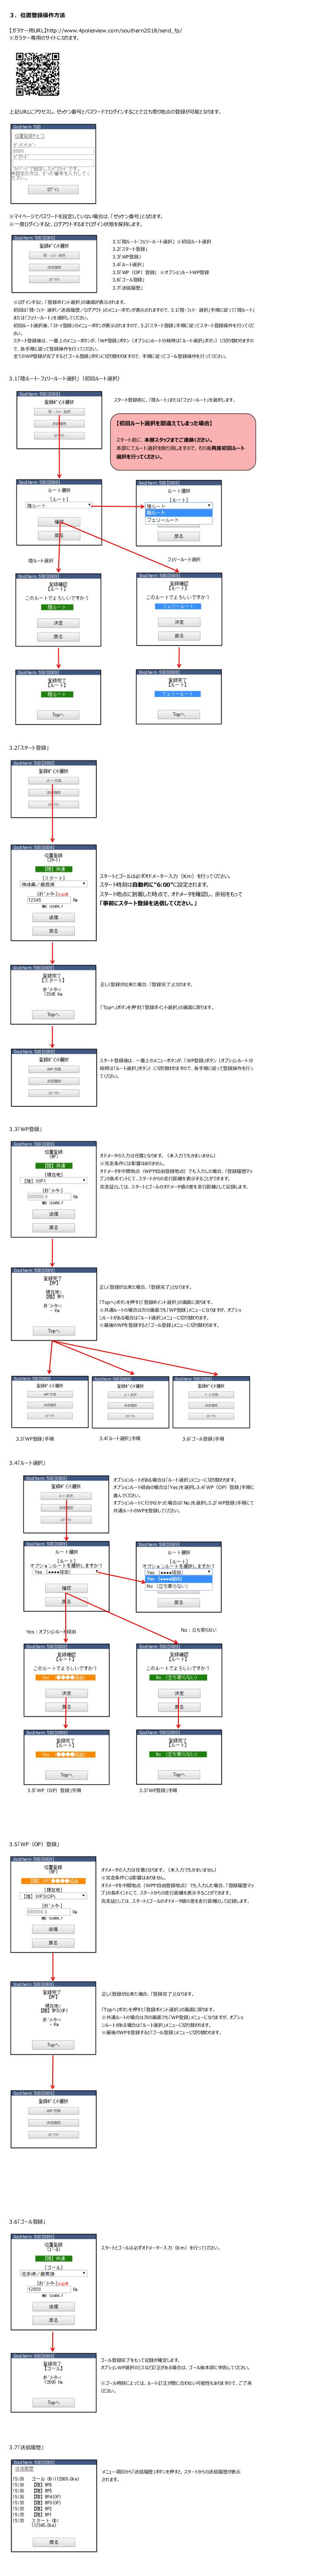 S500操作マニュアルjpeg3.jpg